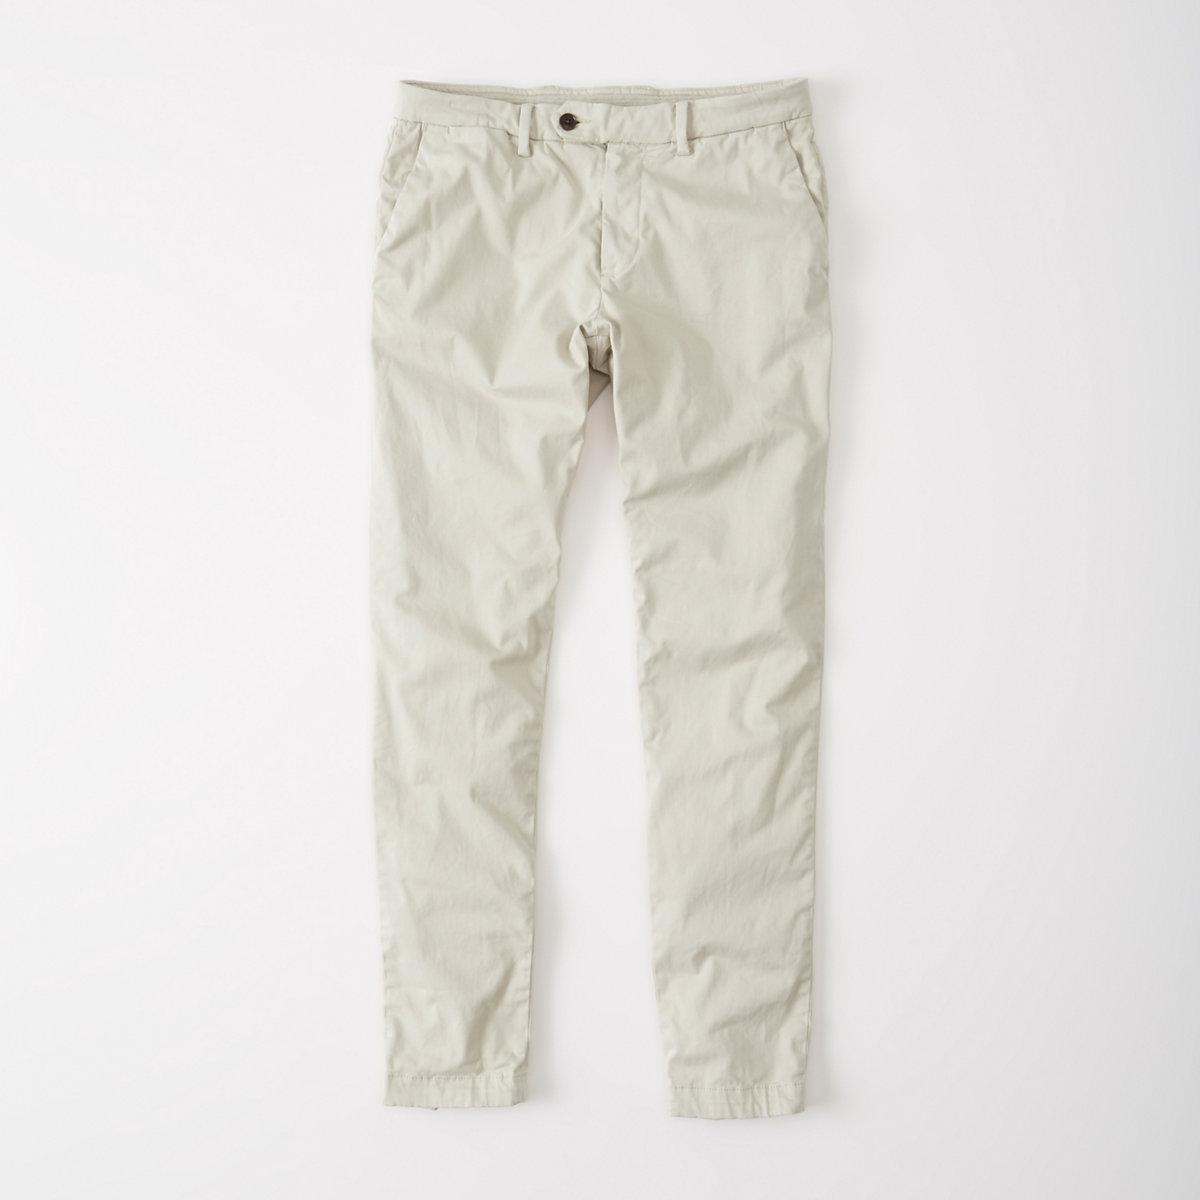 Stretch Sateen Chino Pants